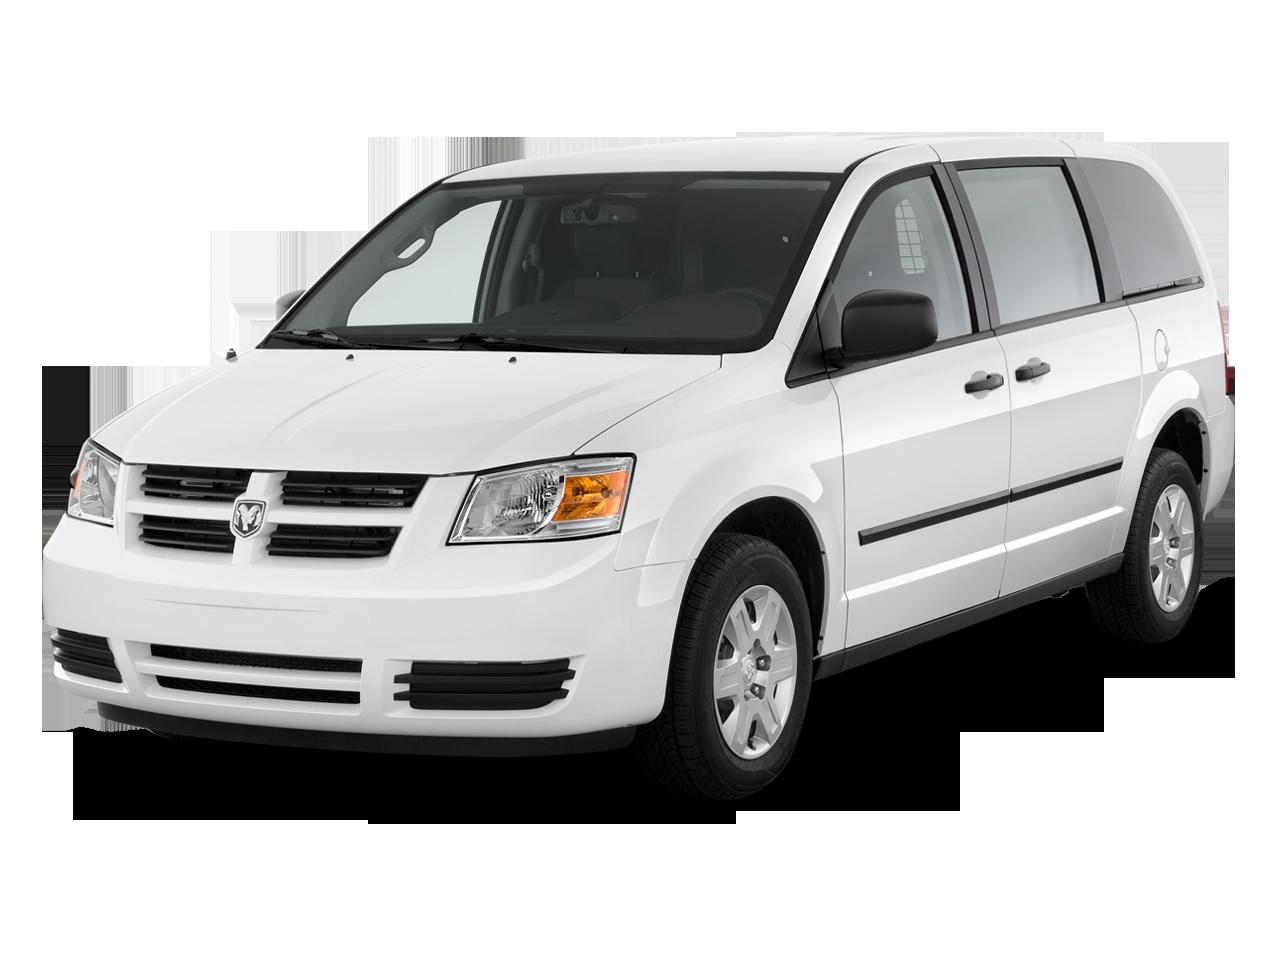 2015 Dodge Grand Caravan Sxt >> 2009 Dodge Grand Caravan SXT 3.8 - Dodge Minivan Review - Automobile Magazine